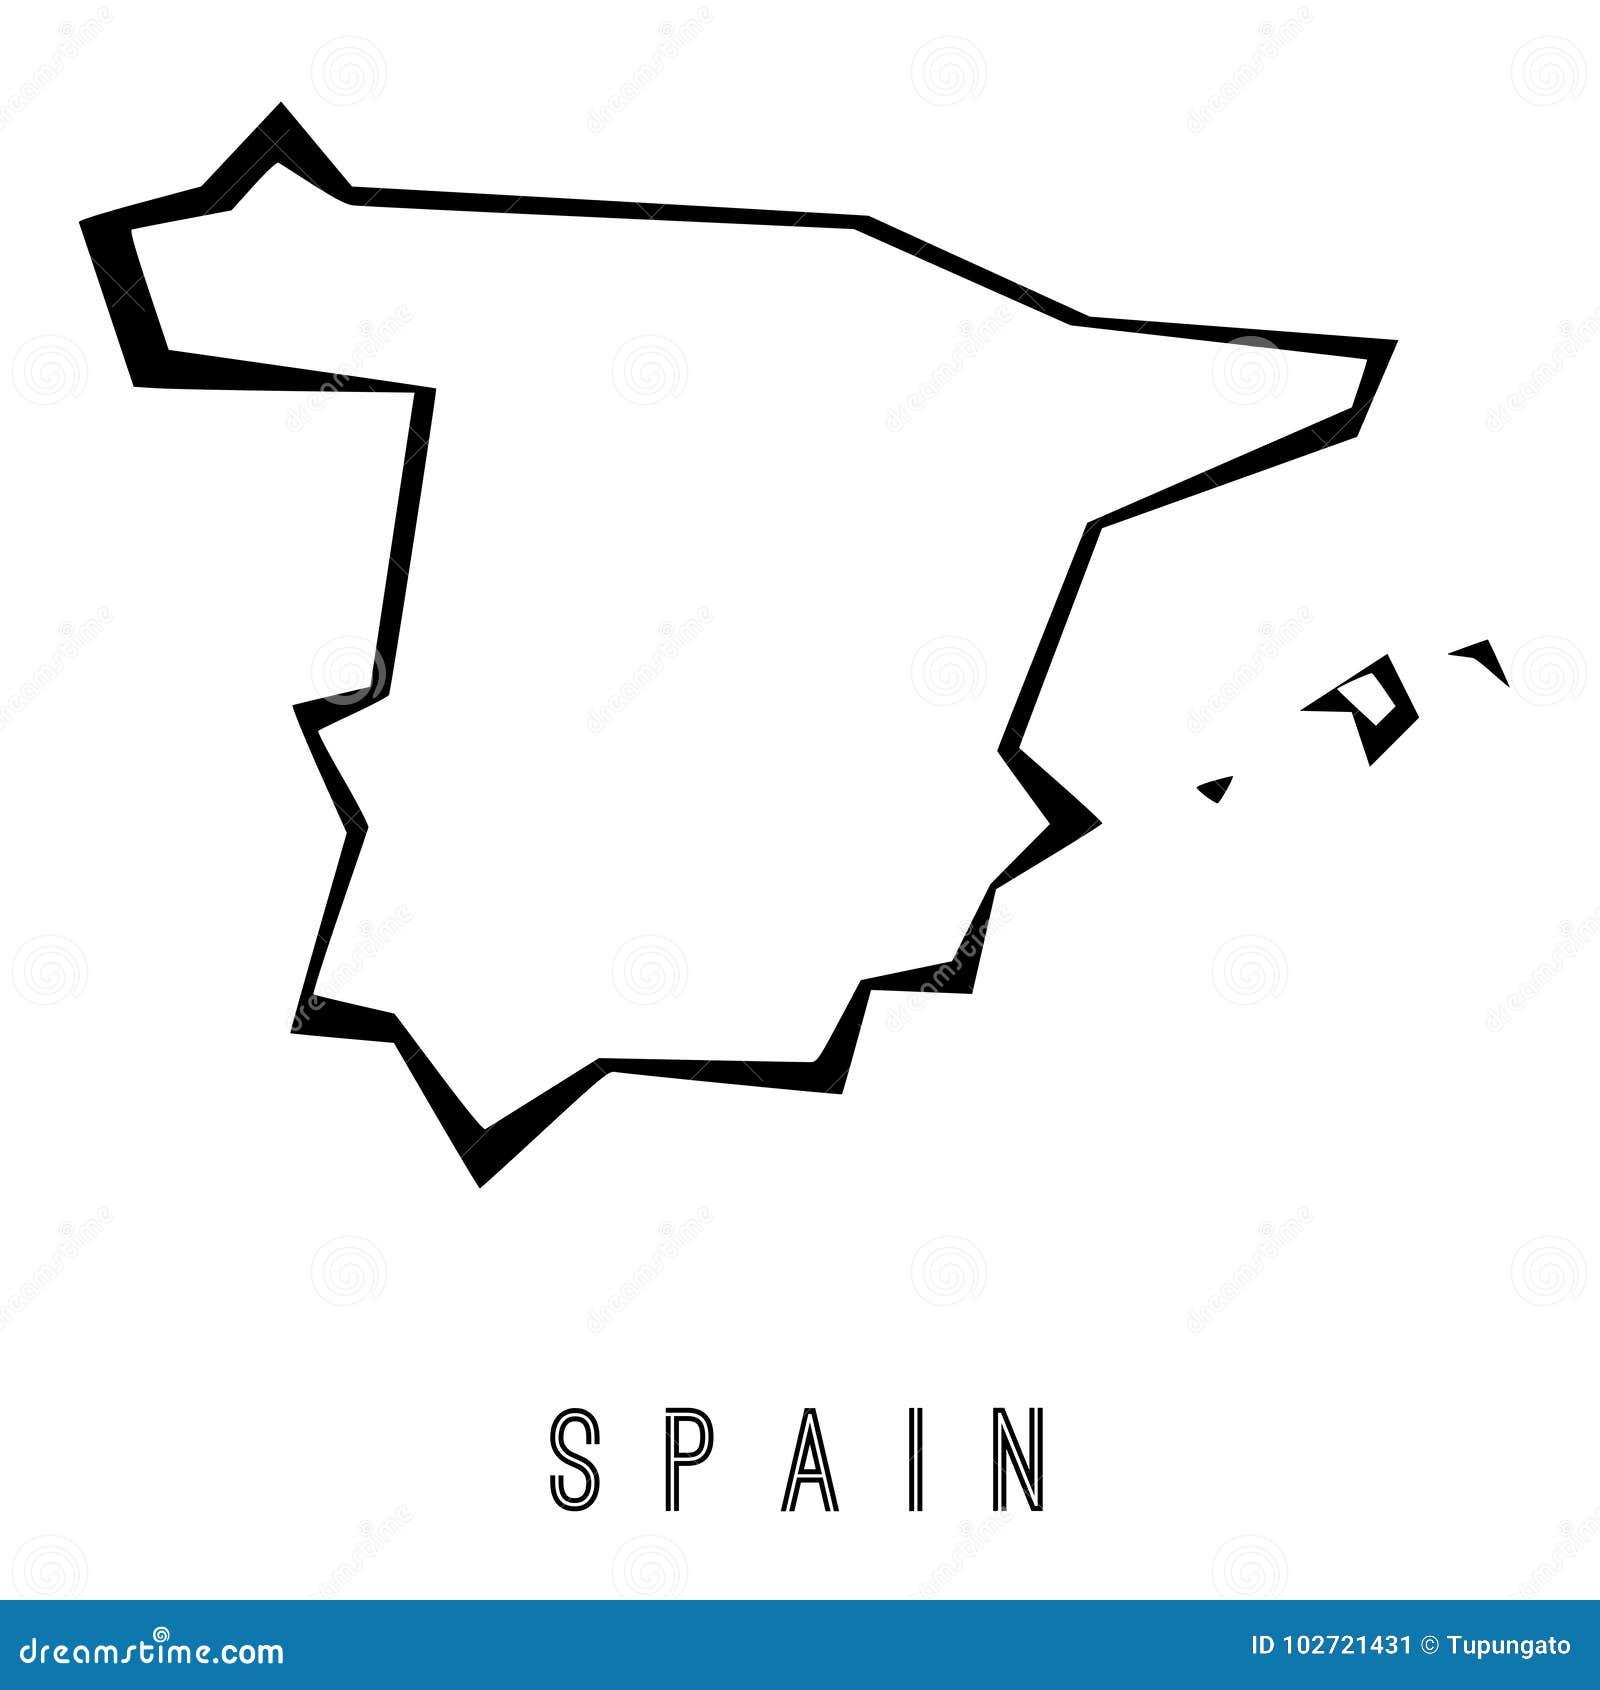 Spain Geometric Map Stock Vector Illustration Of Silhouette 102721431